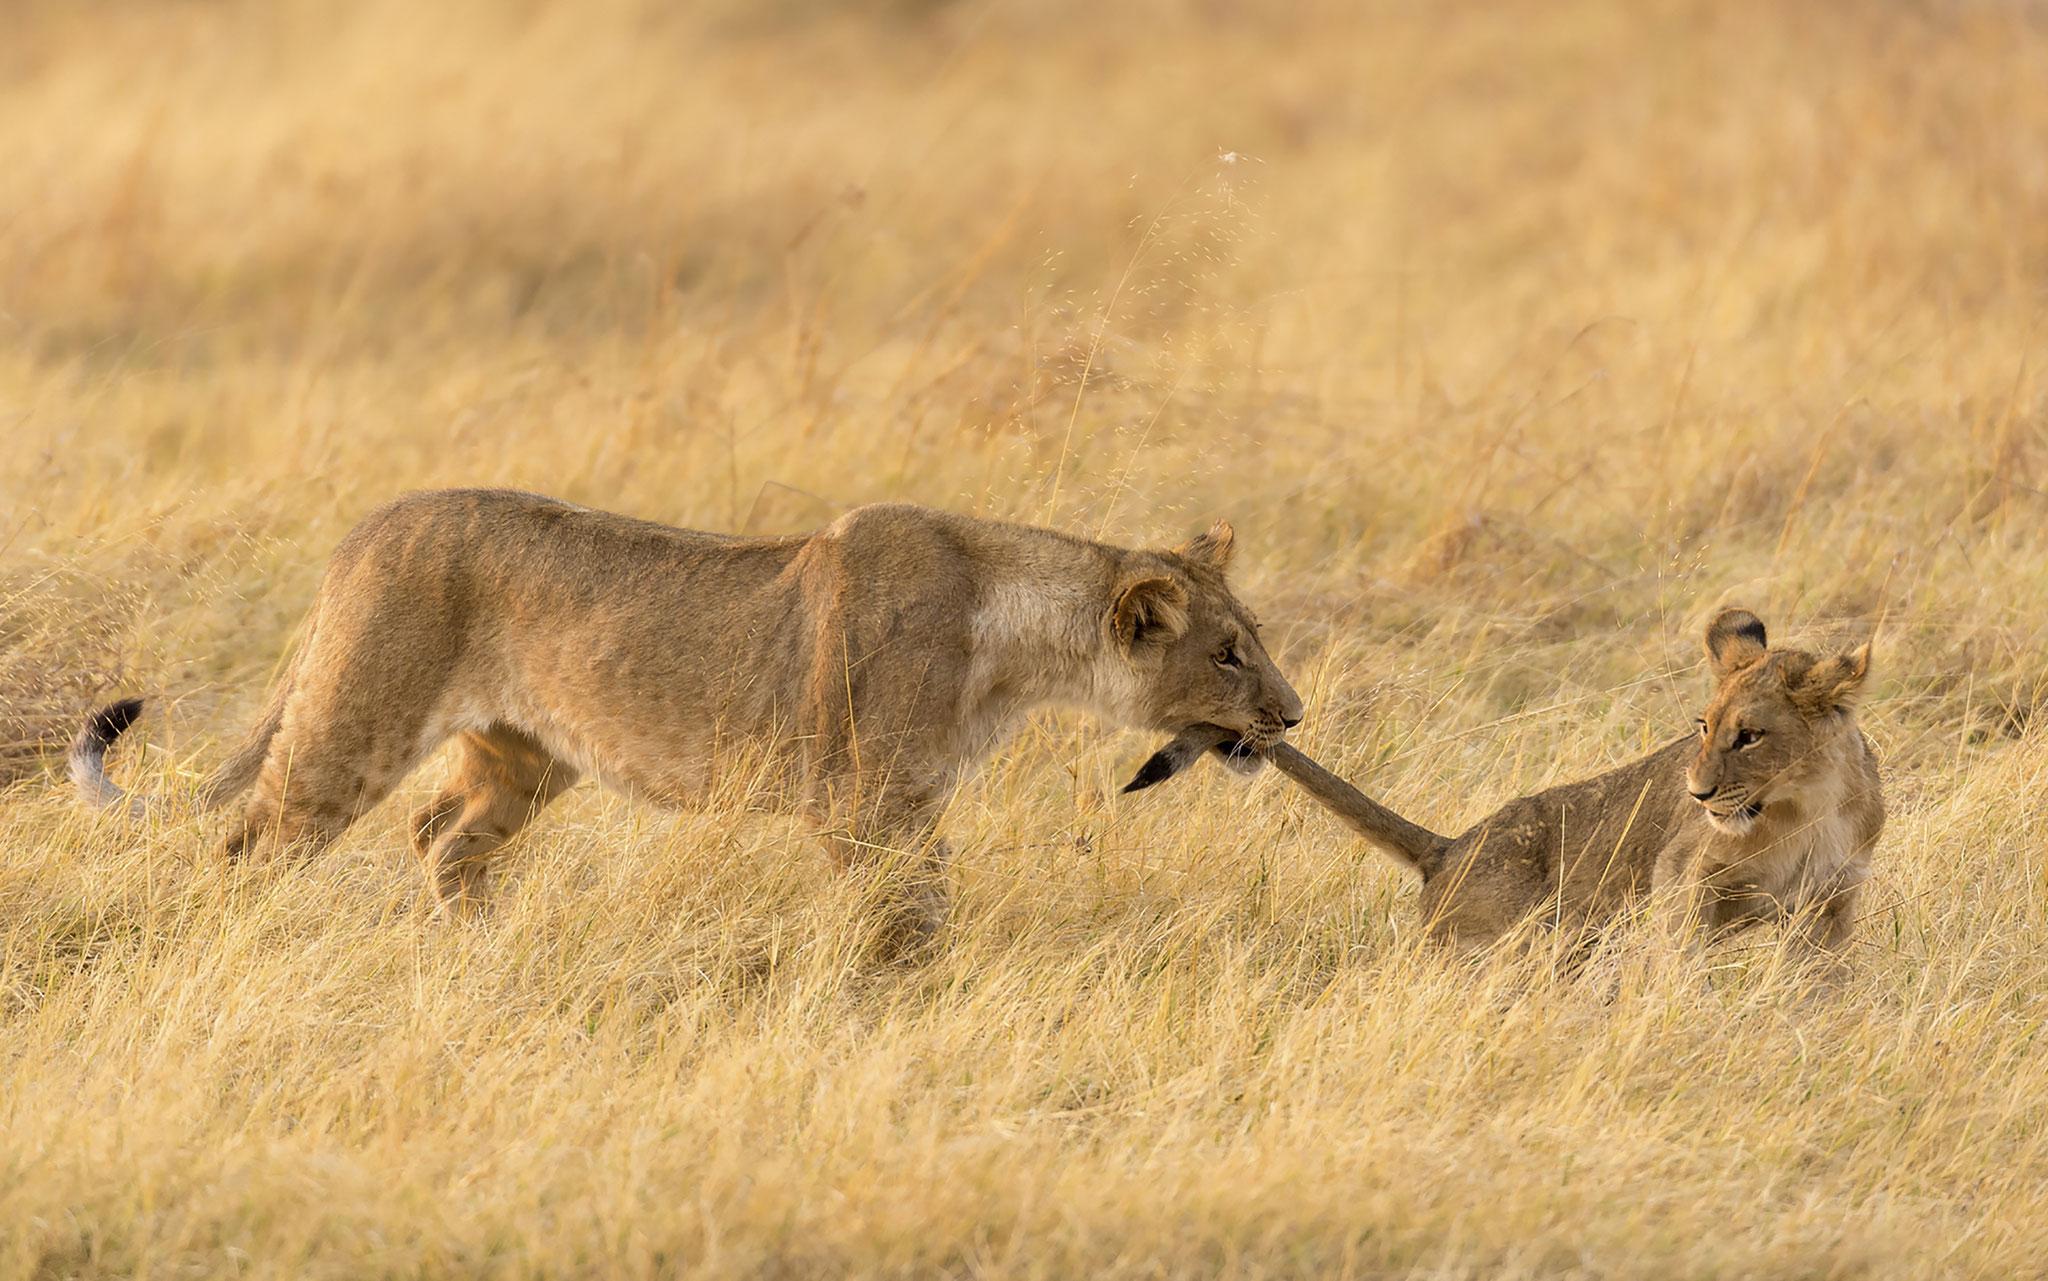 Marco Poggioni (Italy) - Lion and Lioness